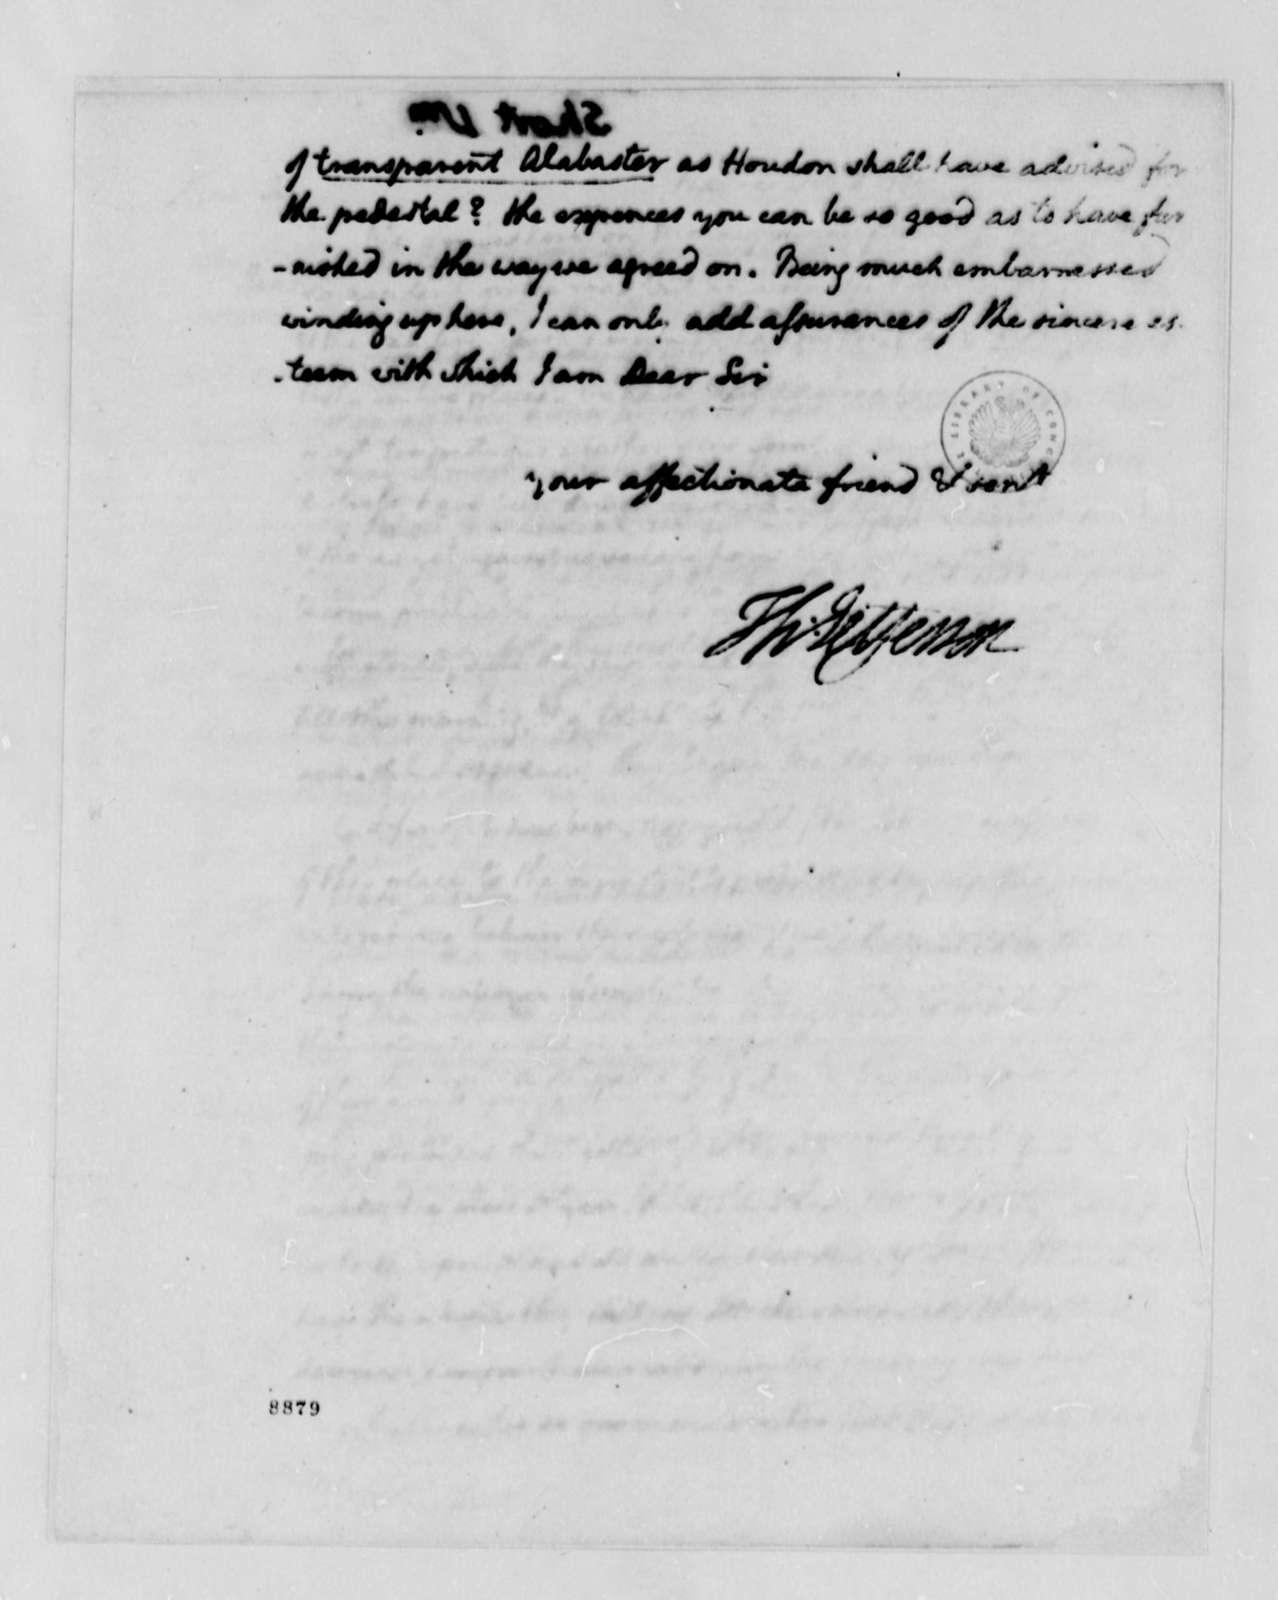 Thomas Jefferson to William Short, October 4, 1789